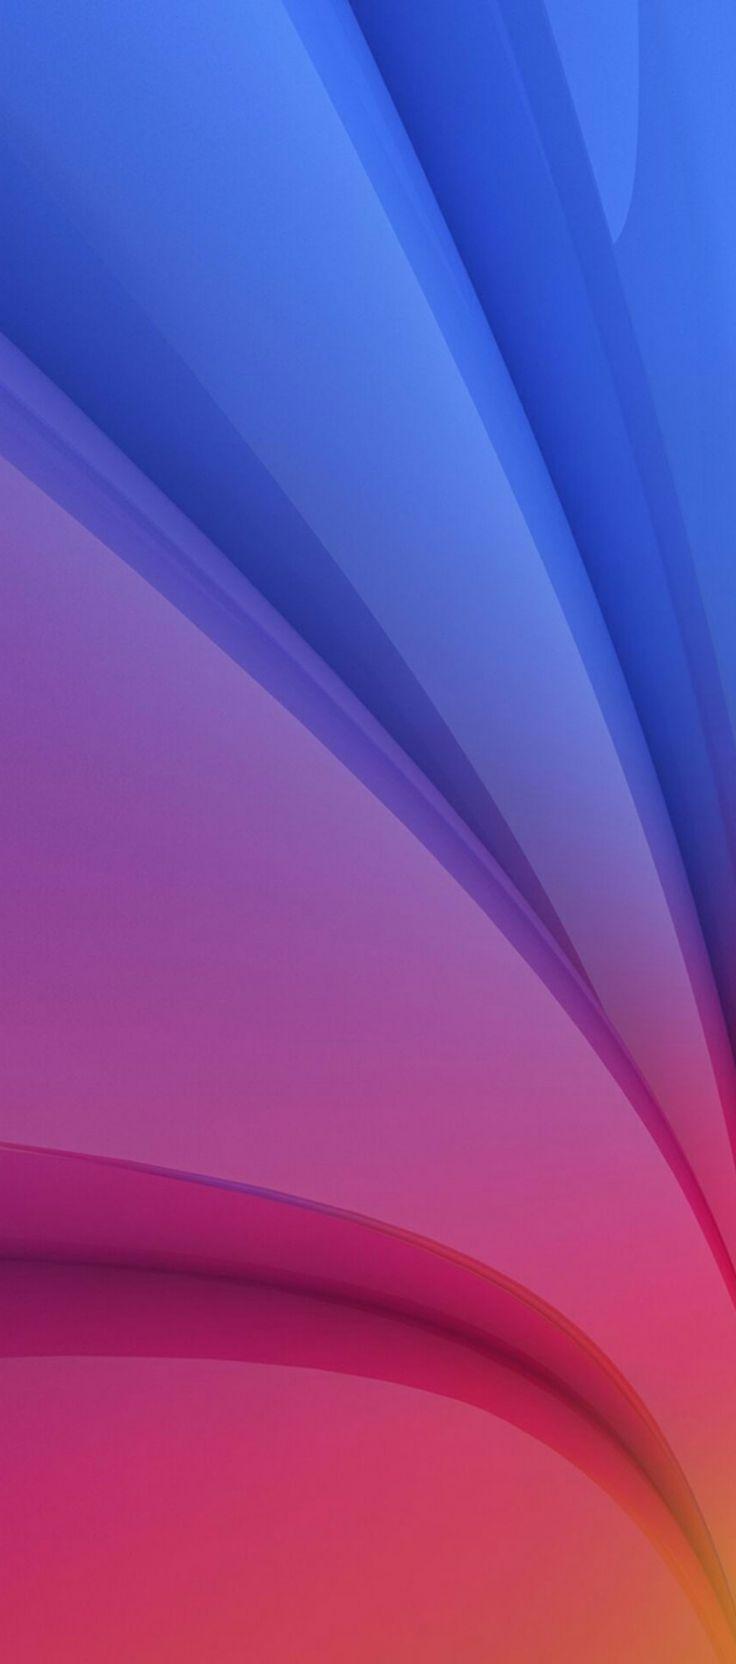 blue, pink, violet, wallpaper, pattern, galaxy, colour, abstract, digital art, s8, walls, Samsung, galaxy s8